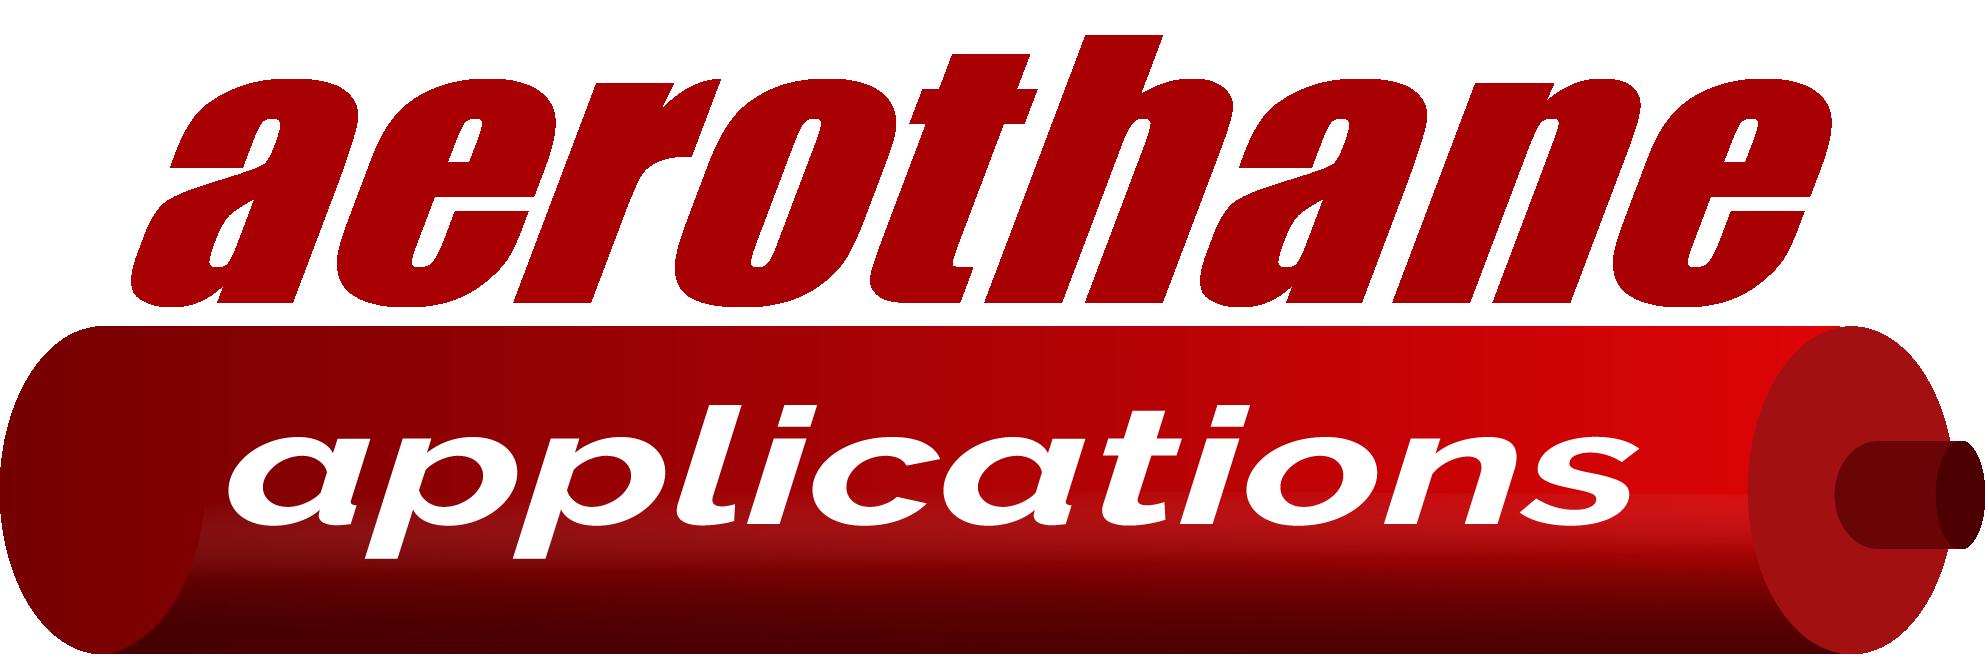 Aerothane Applications